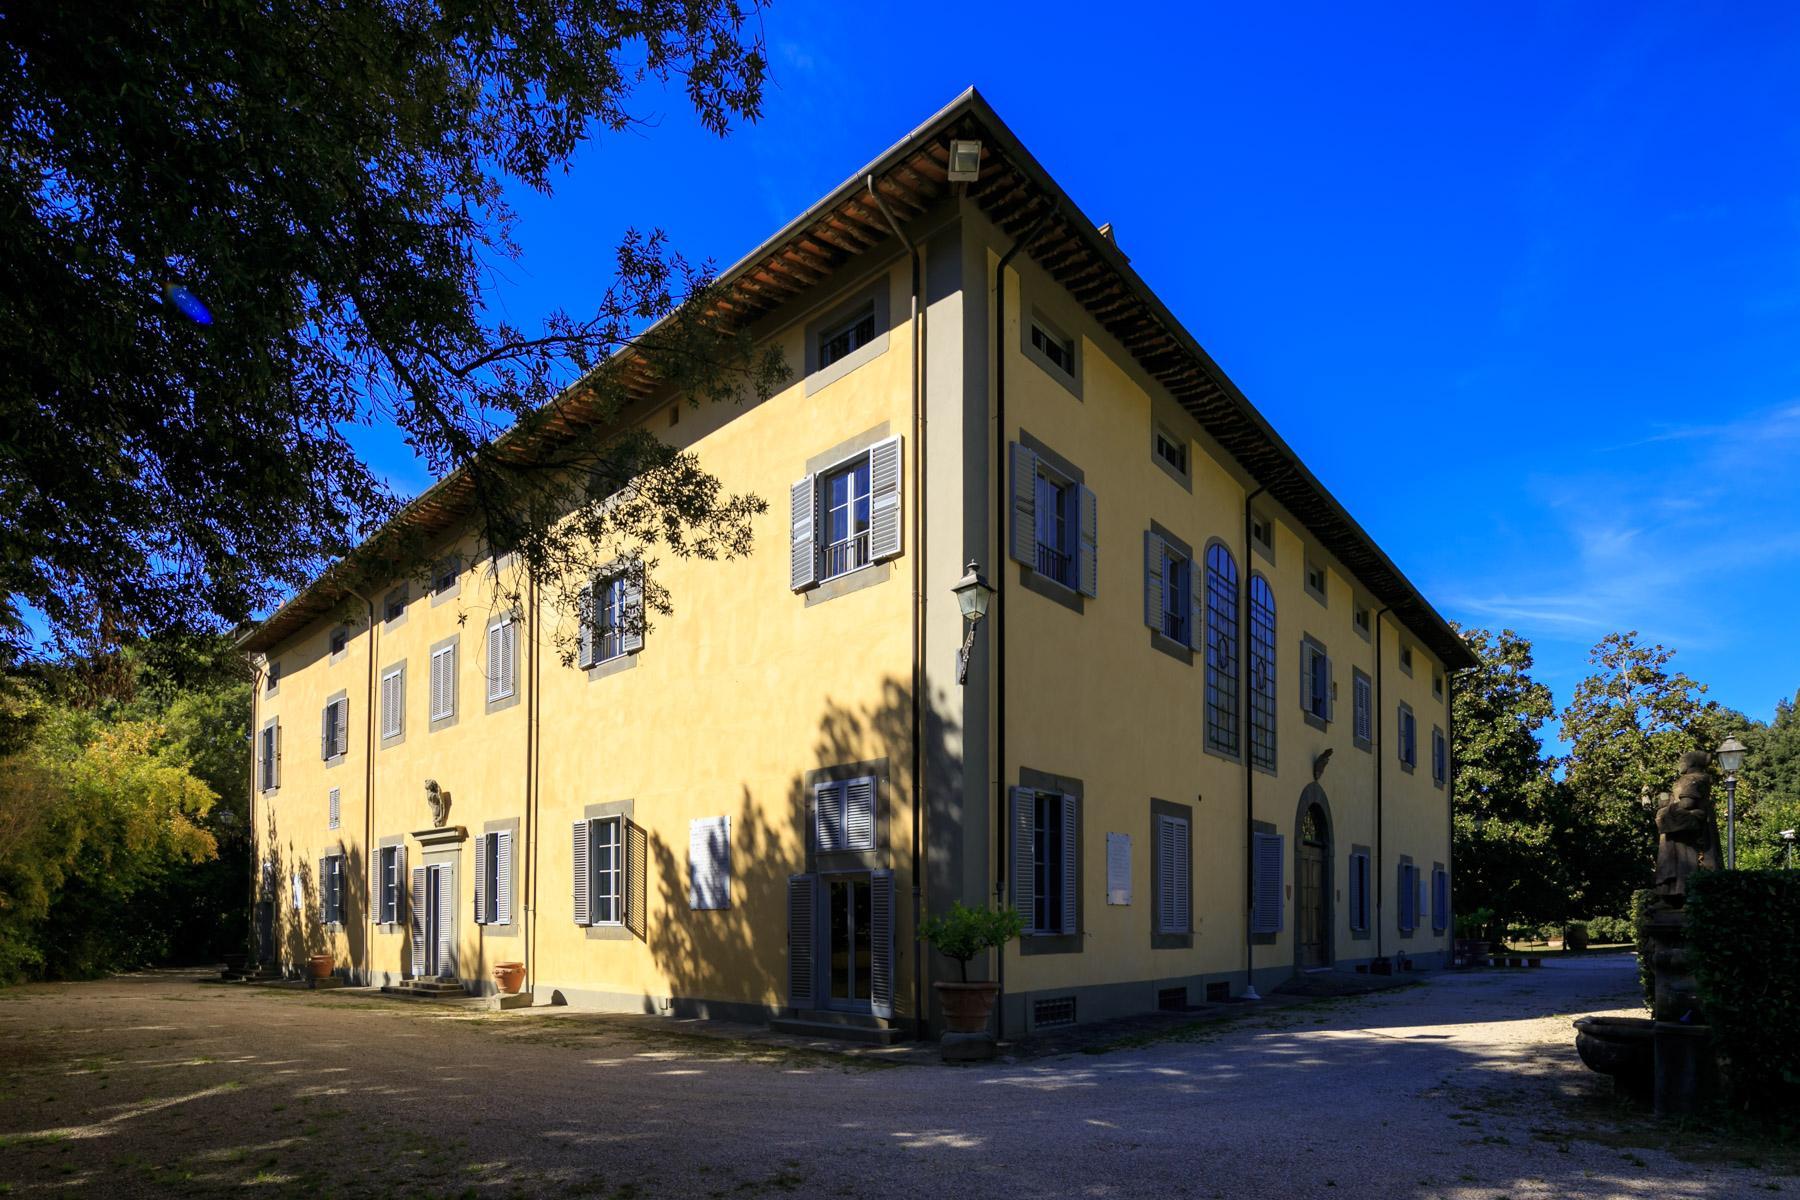 Exquisite 16th century property - 21